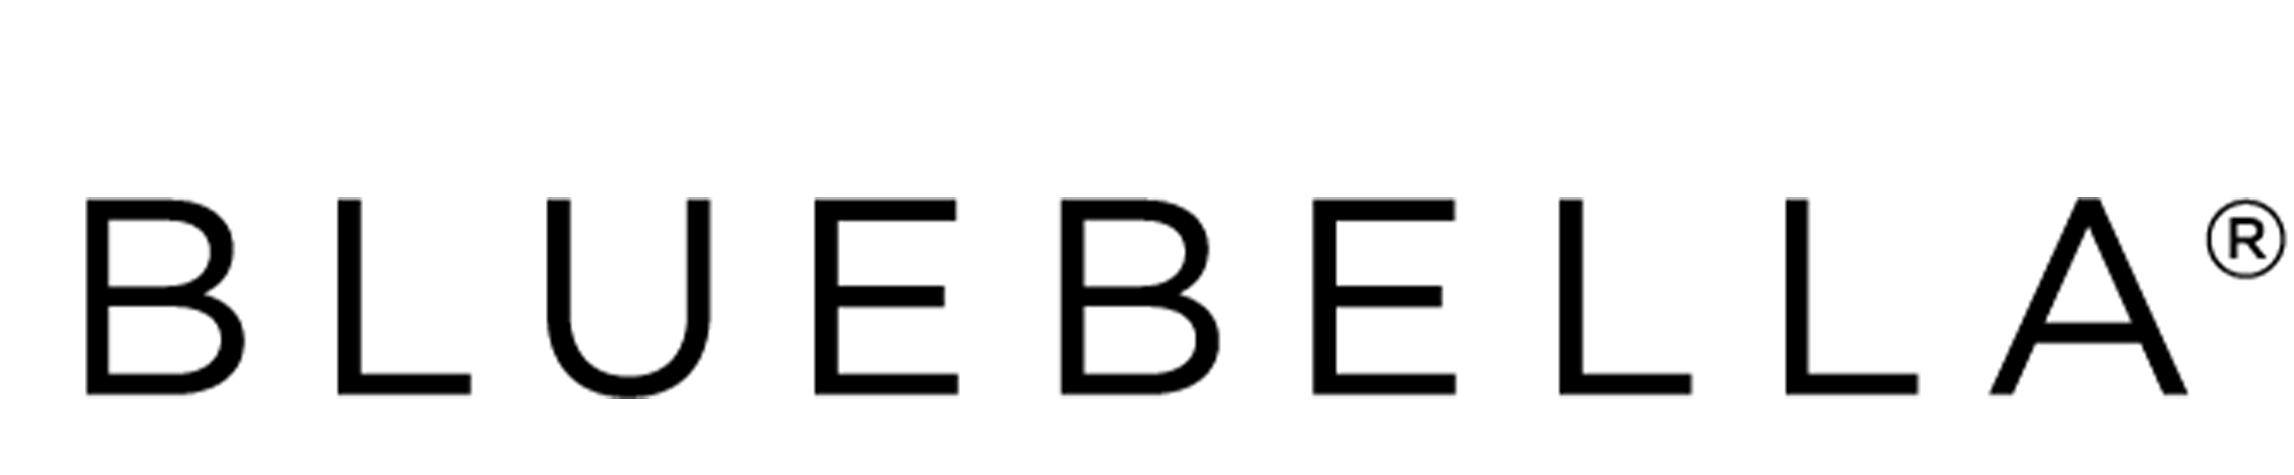 (bluebella.it Logo)